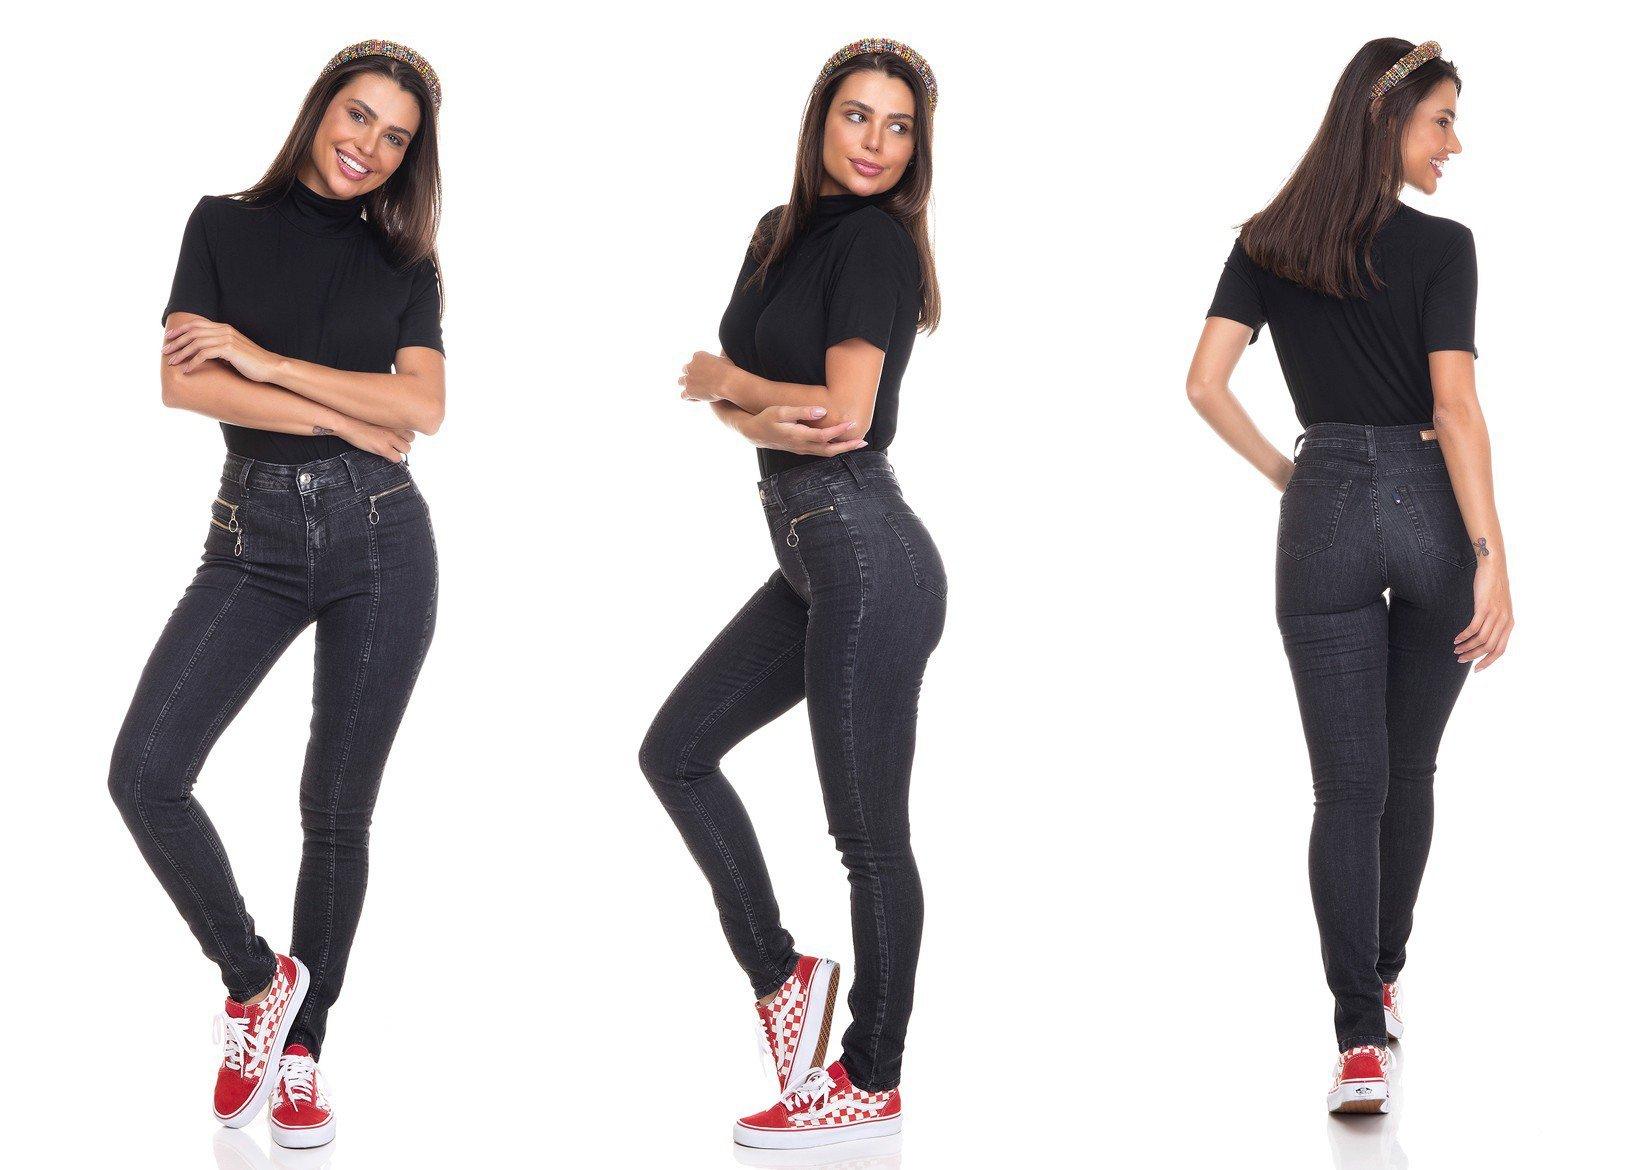 dz3374 calca jeans feminina skinny media bolsos com ziper denim zero tripla